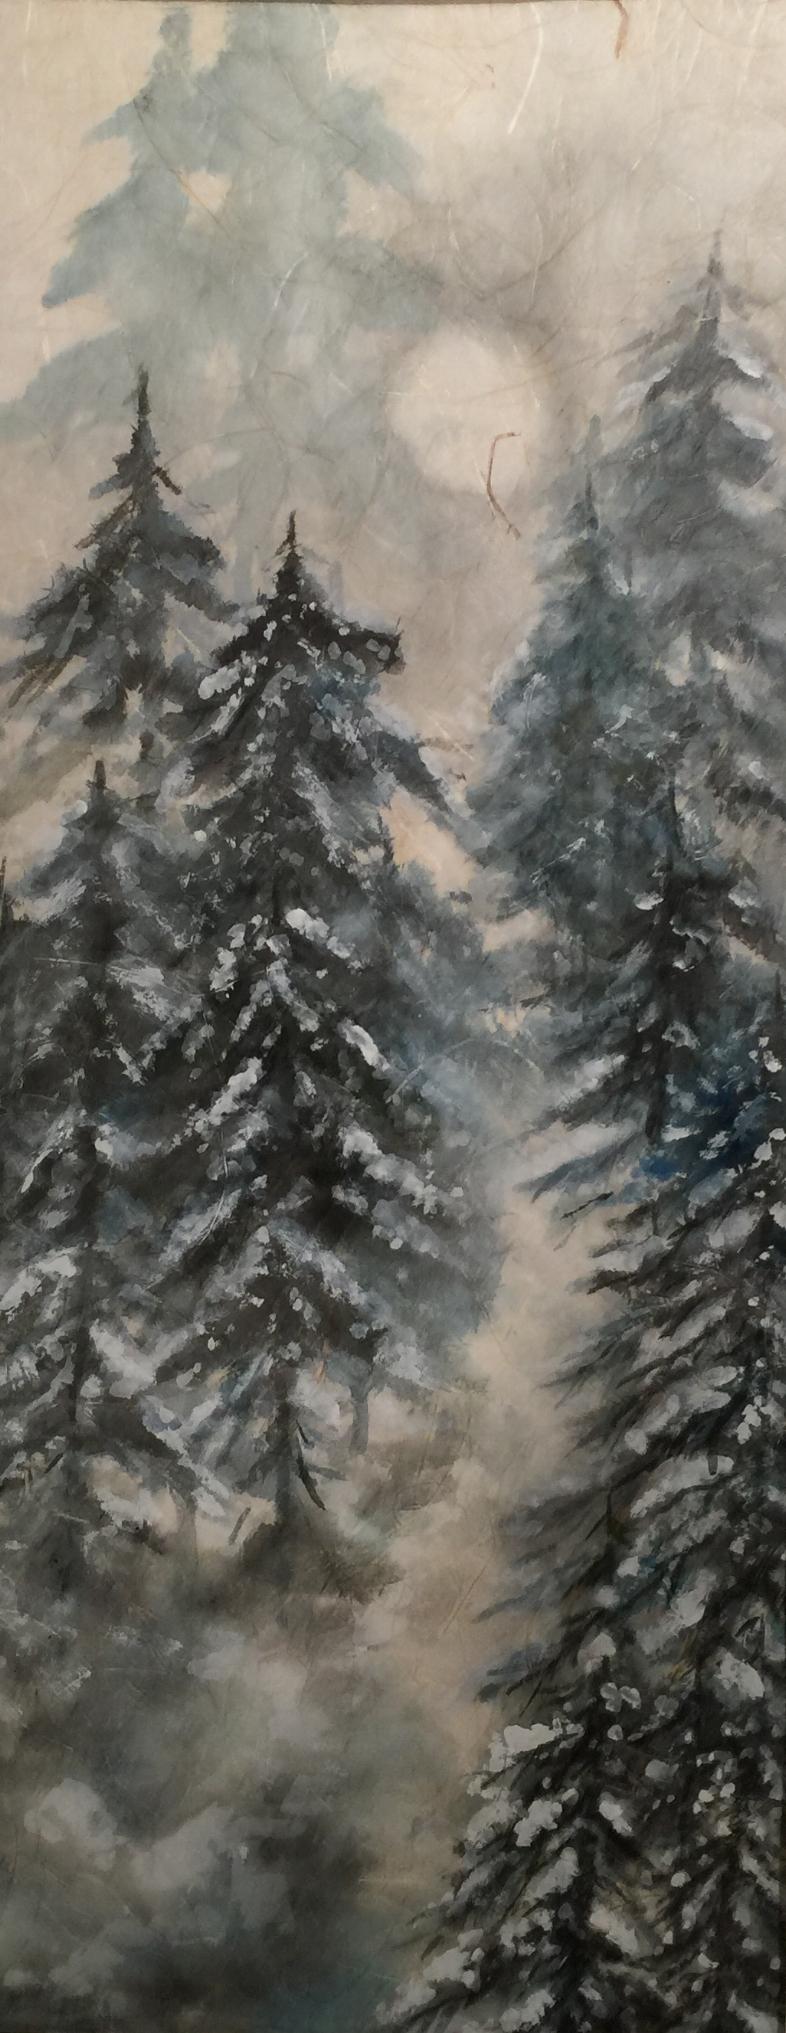 Pines & Moon